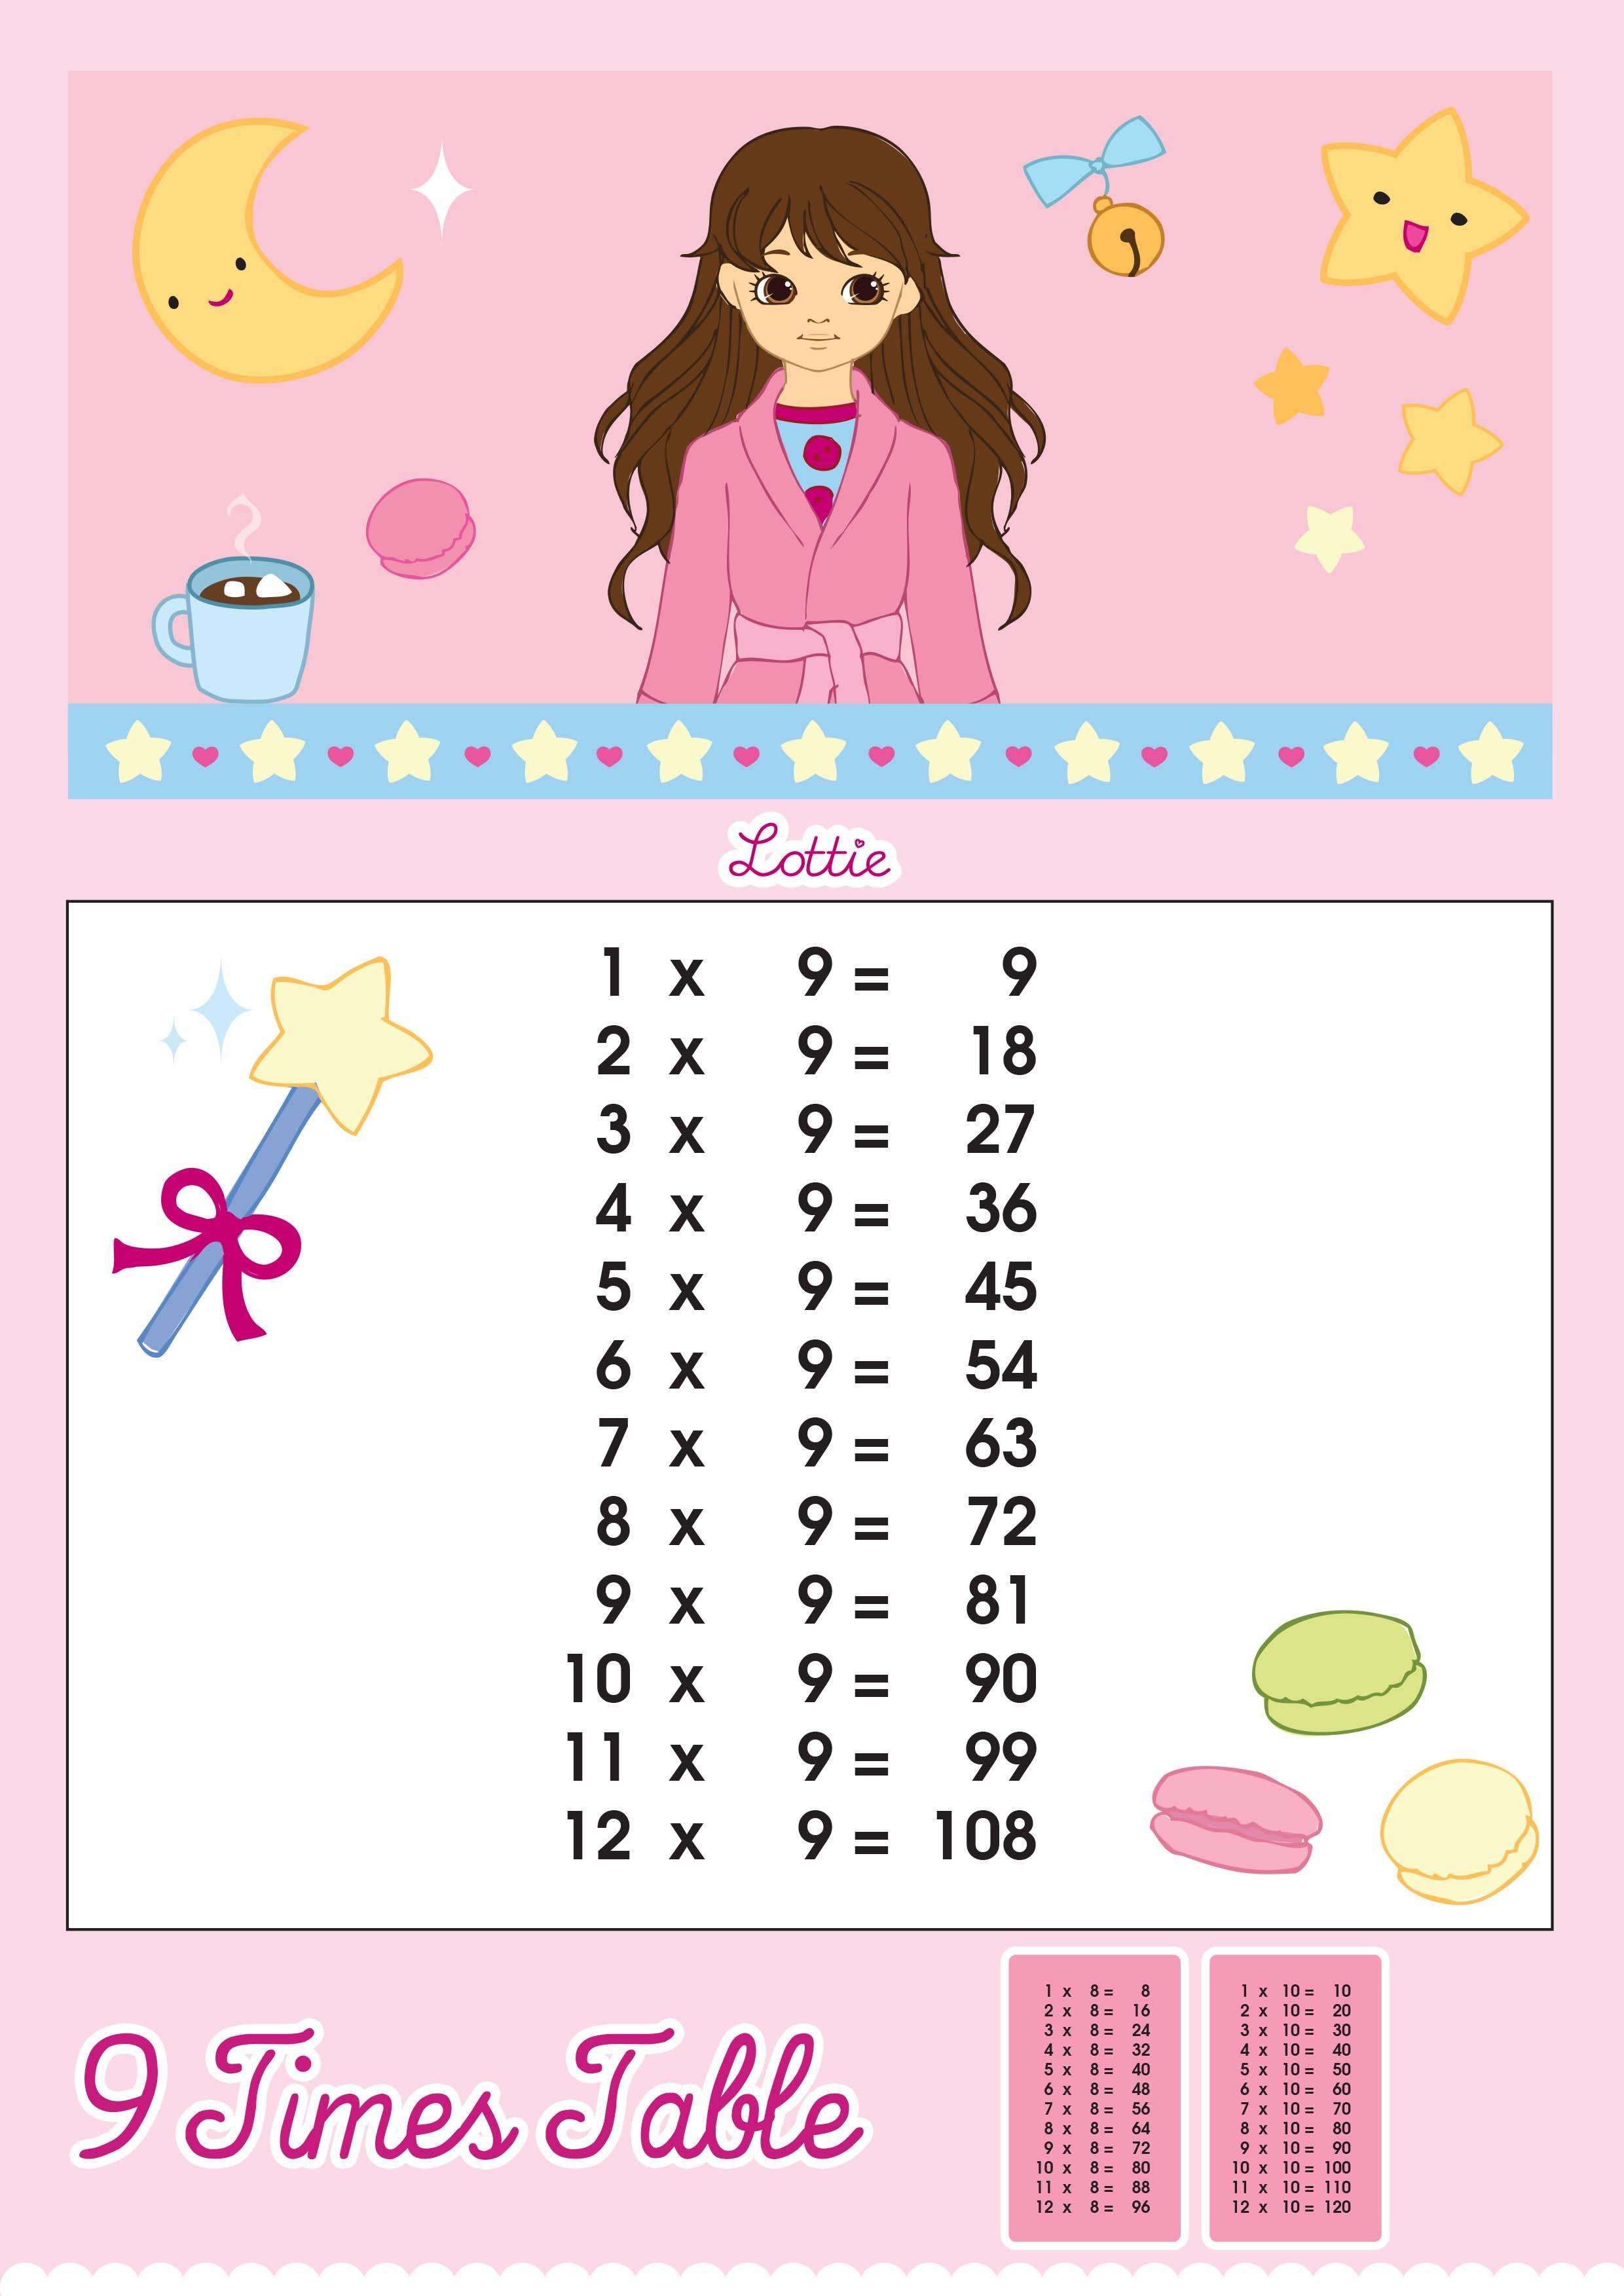 Lottie Doll Printable 9 Times Tables 2 480 3 507 Pixels